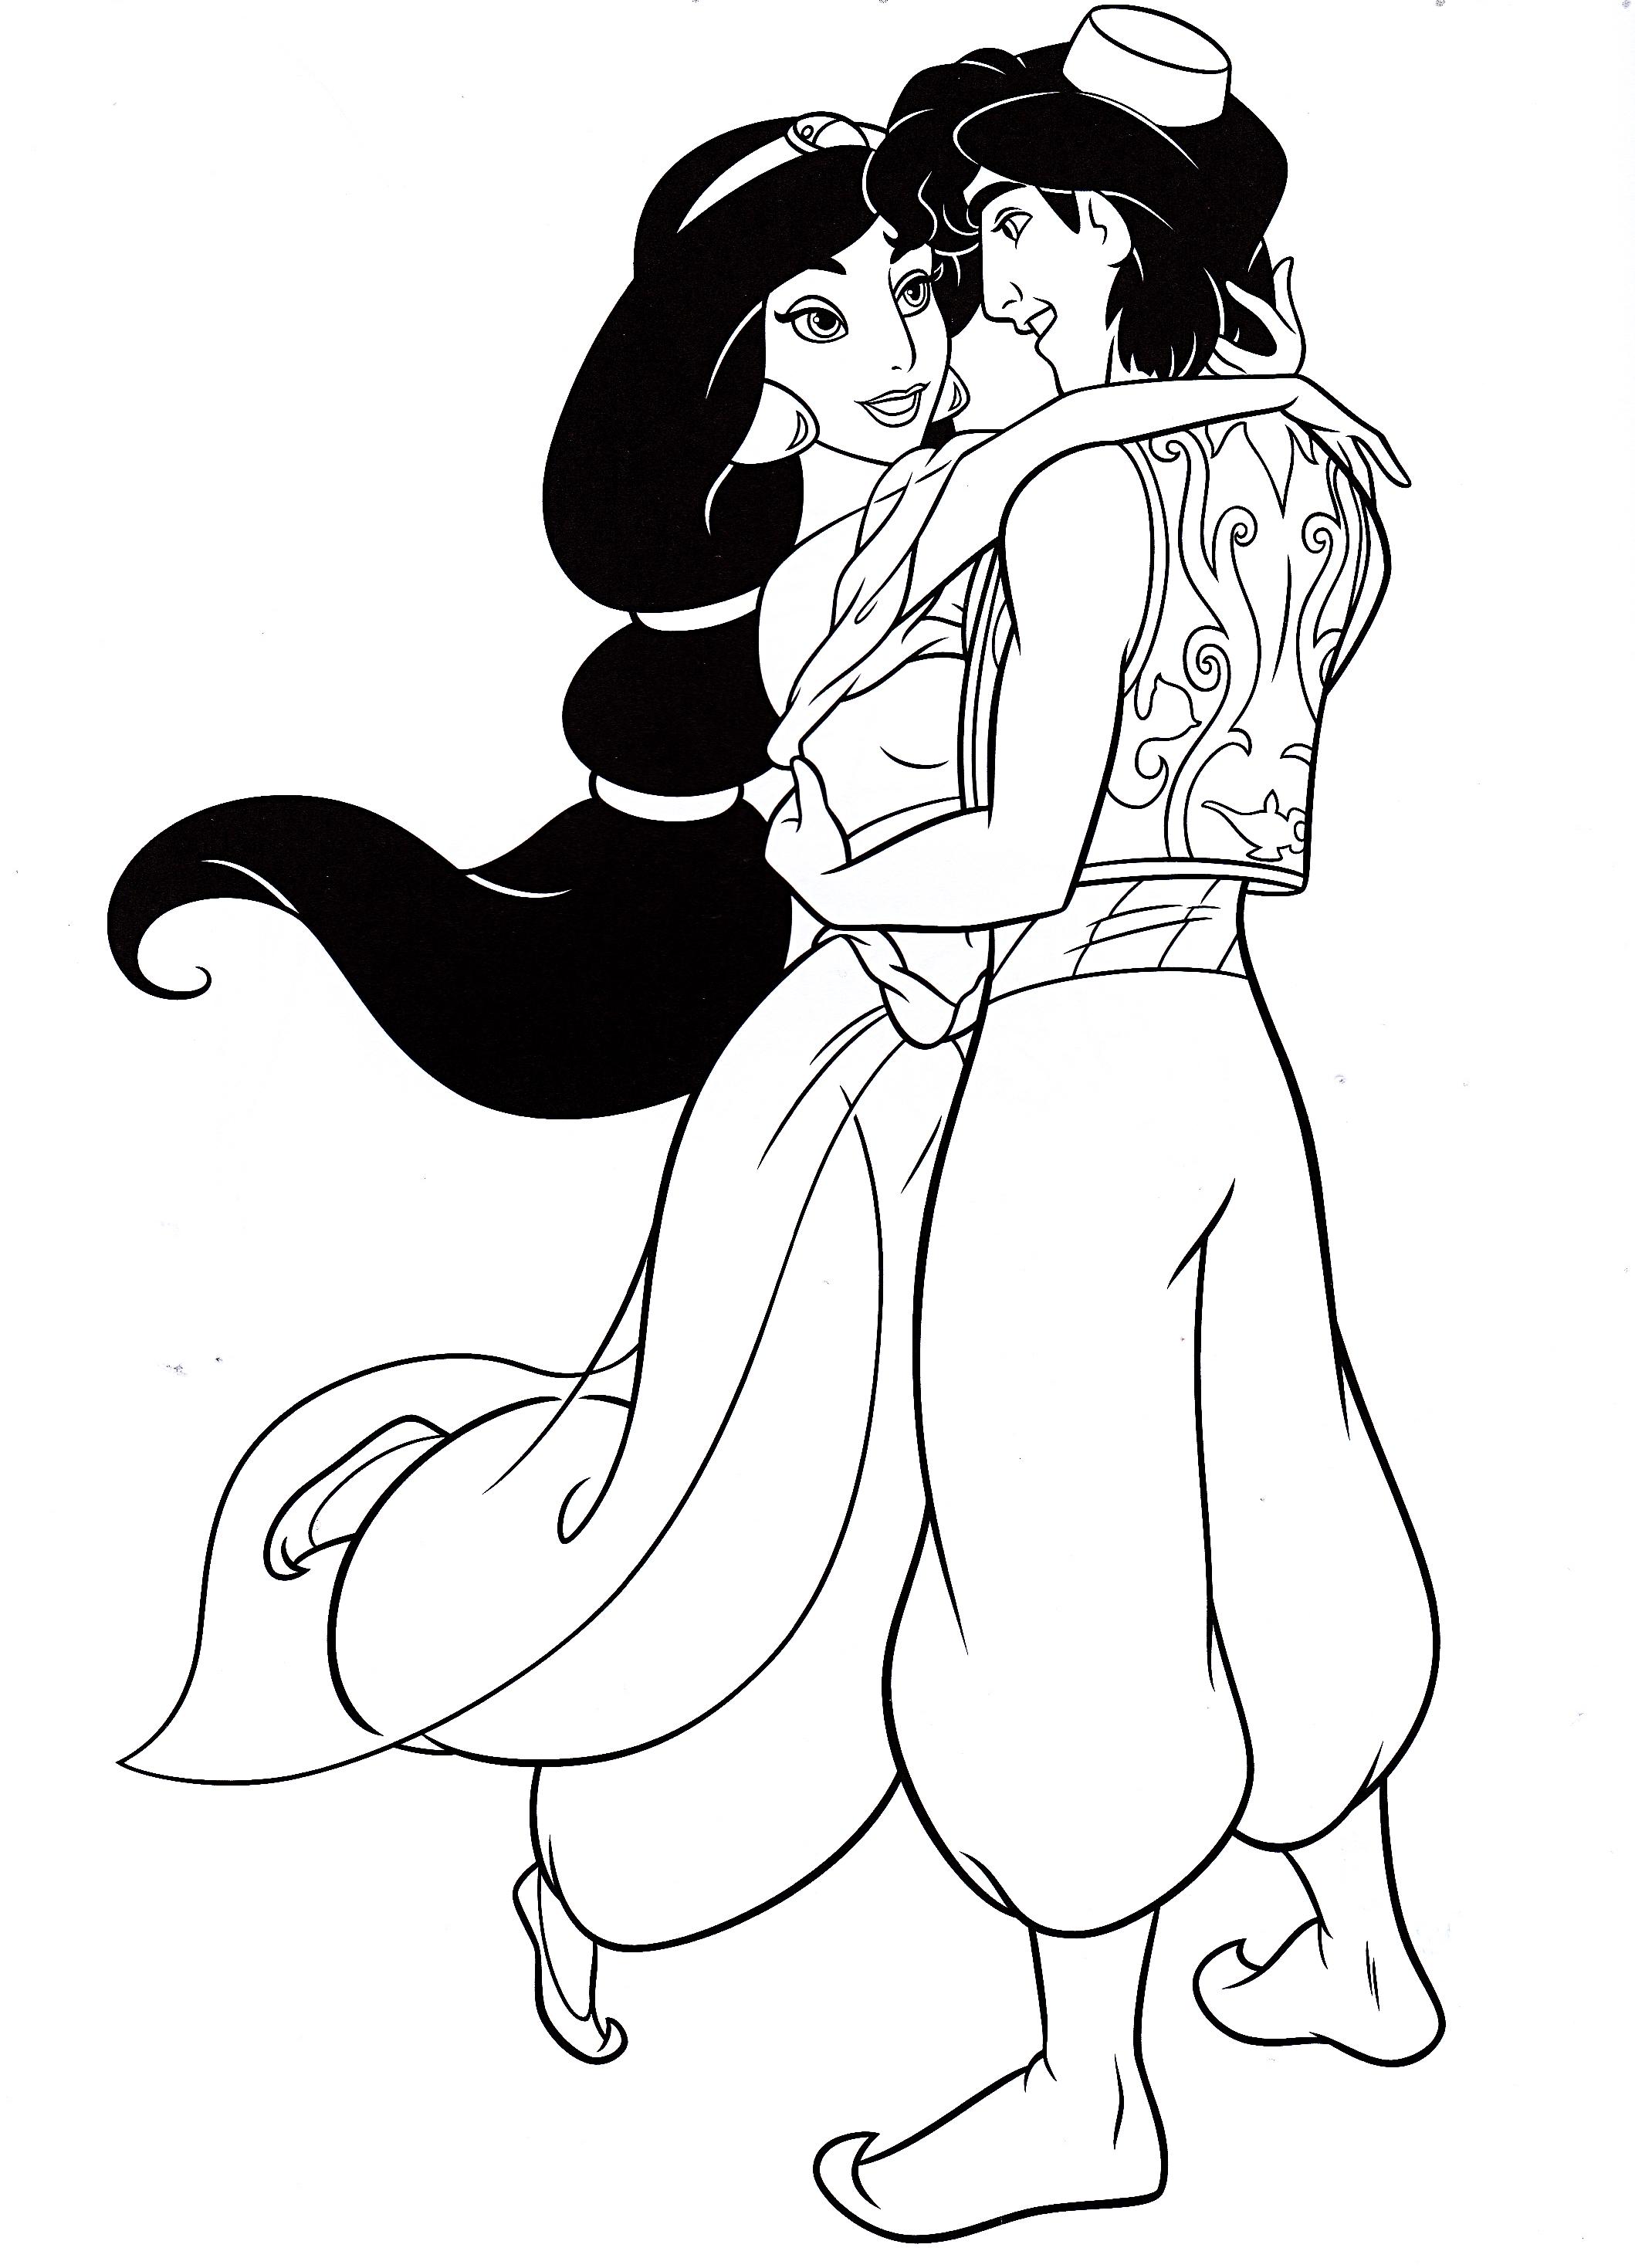 Walt Disney Coloring Pages - Princess Jasmine & Prince ...